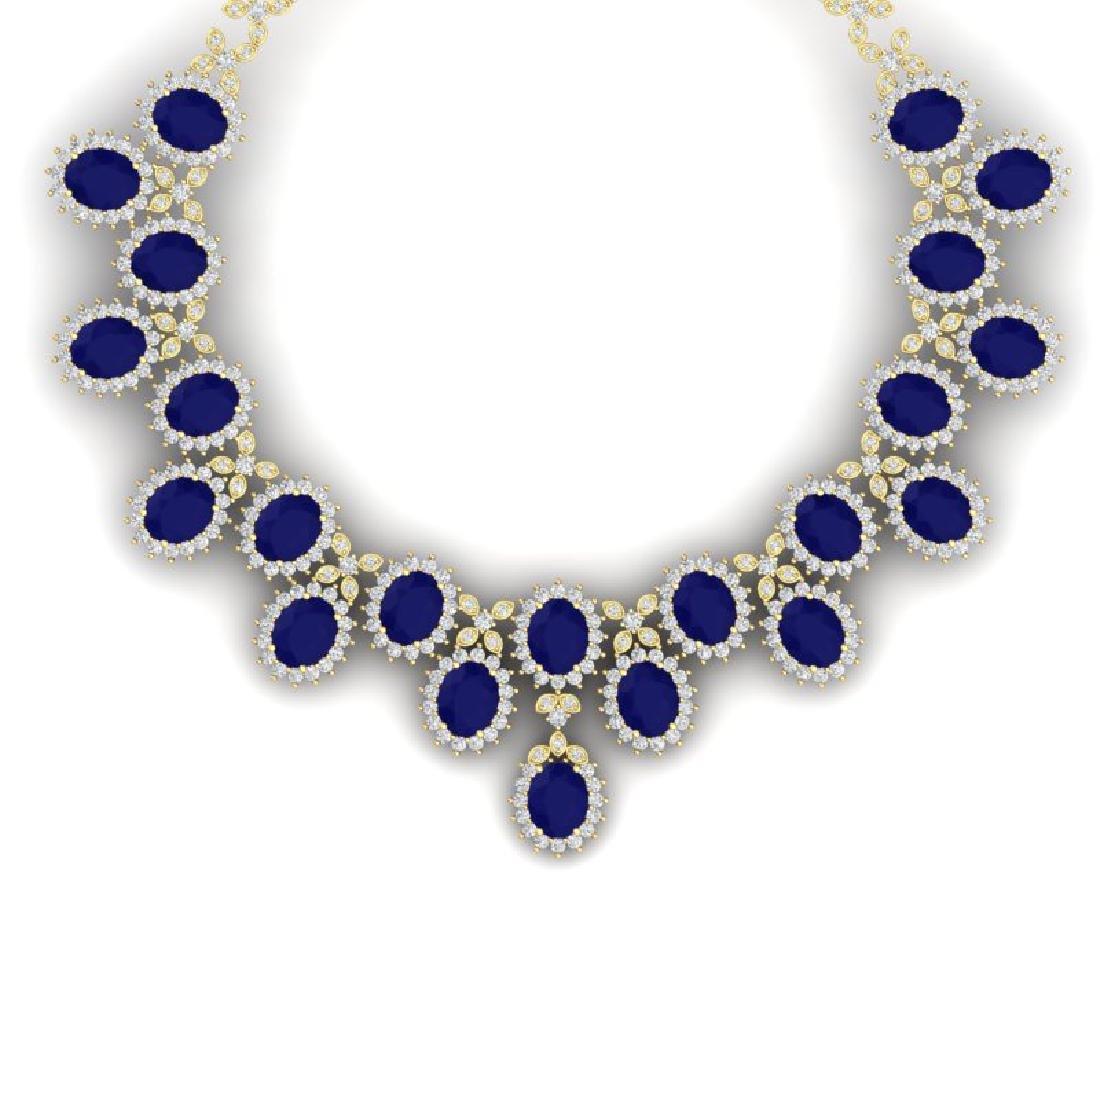 81 CTW Royalty Sapphire & VS Diamond Necklace 18K